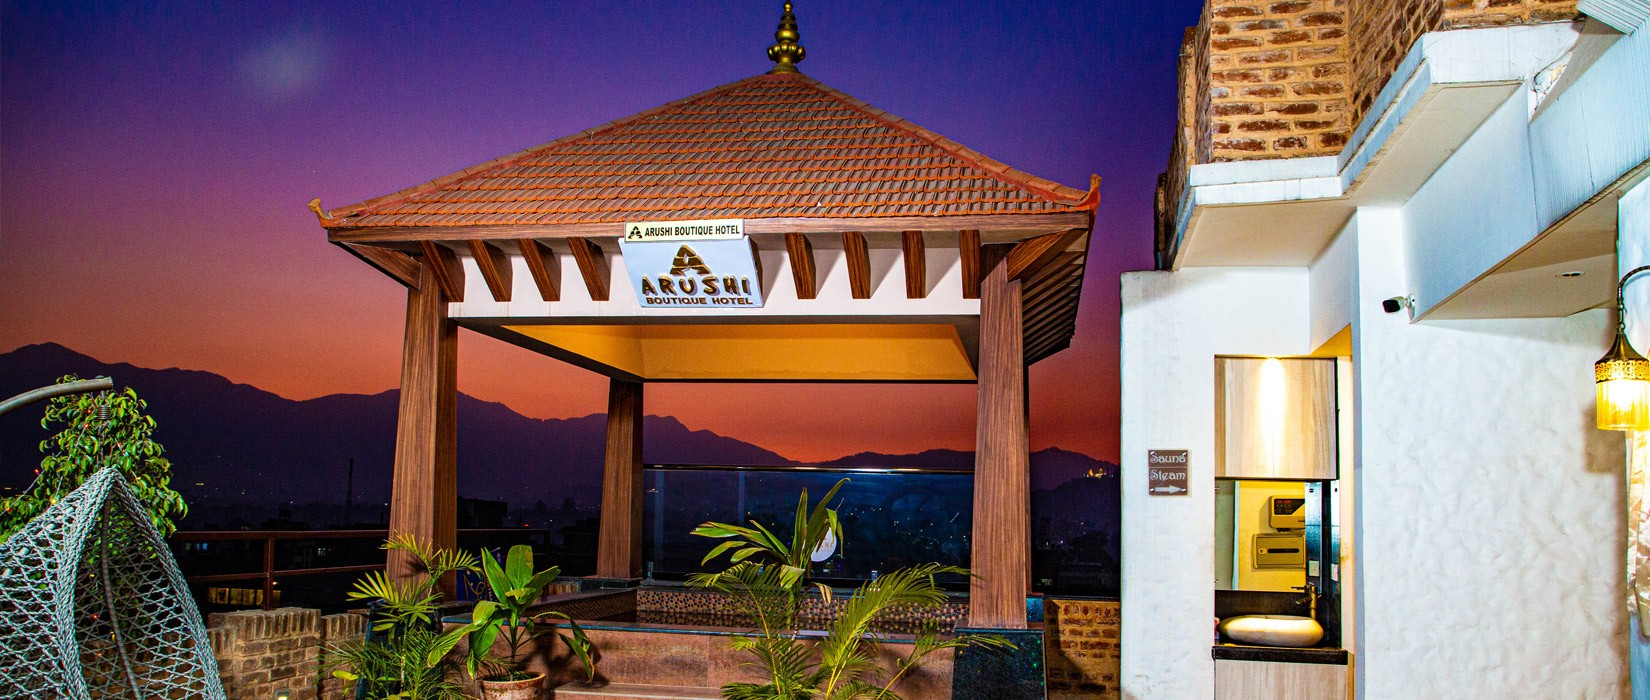 Marpha Bar Arushi Boutique Hotel